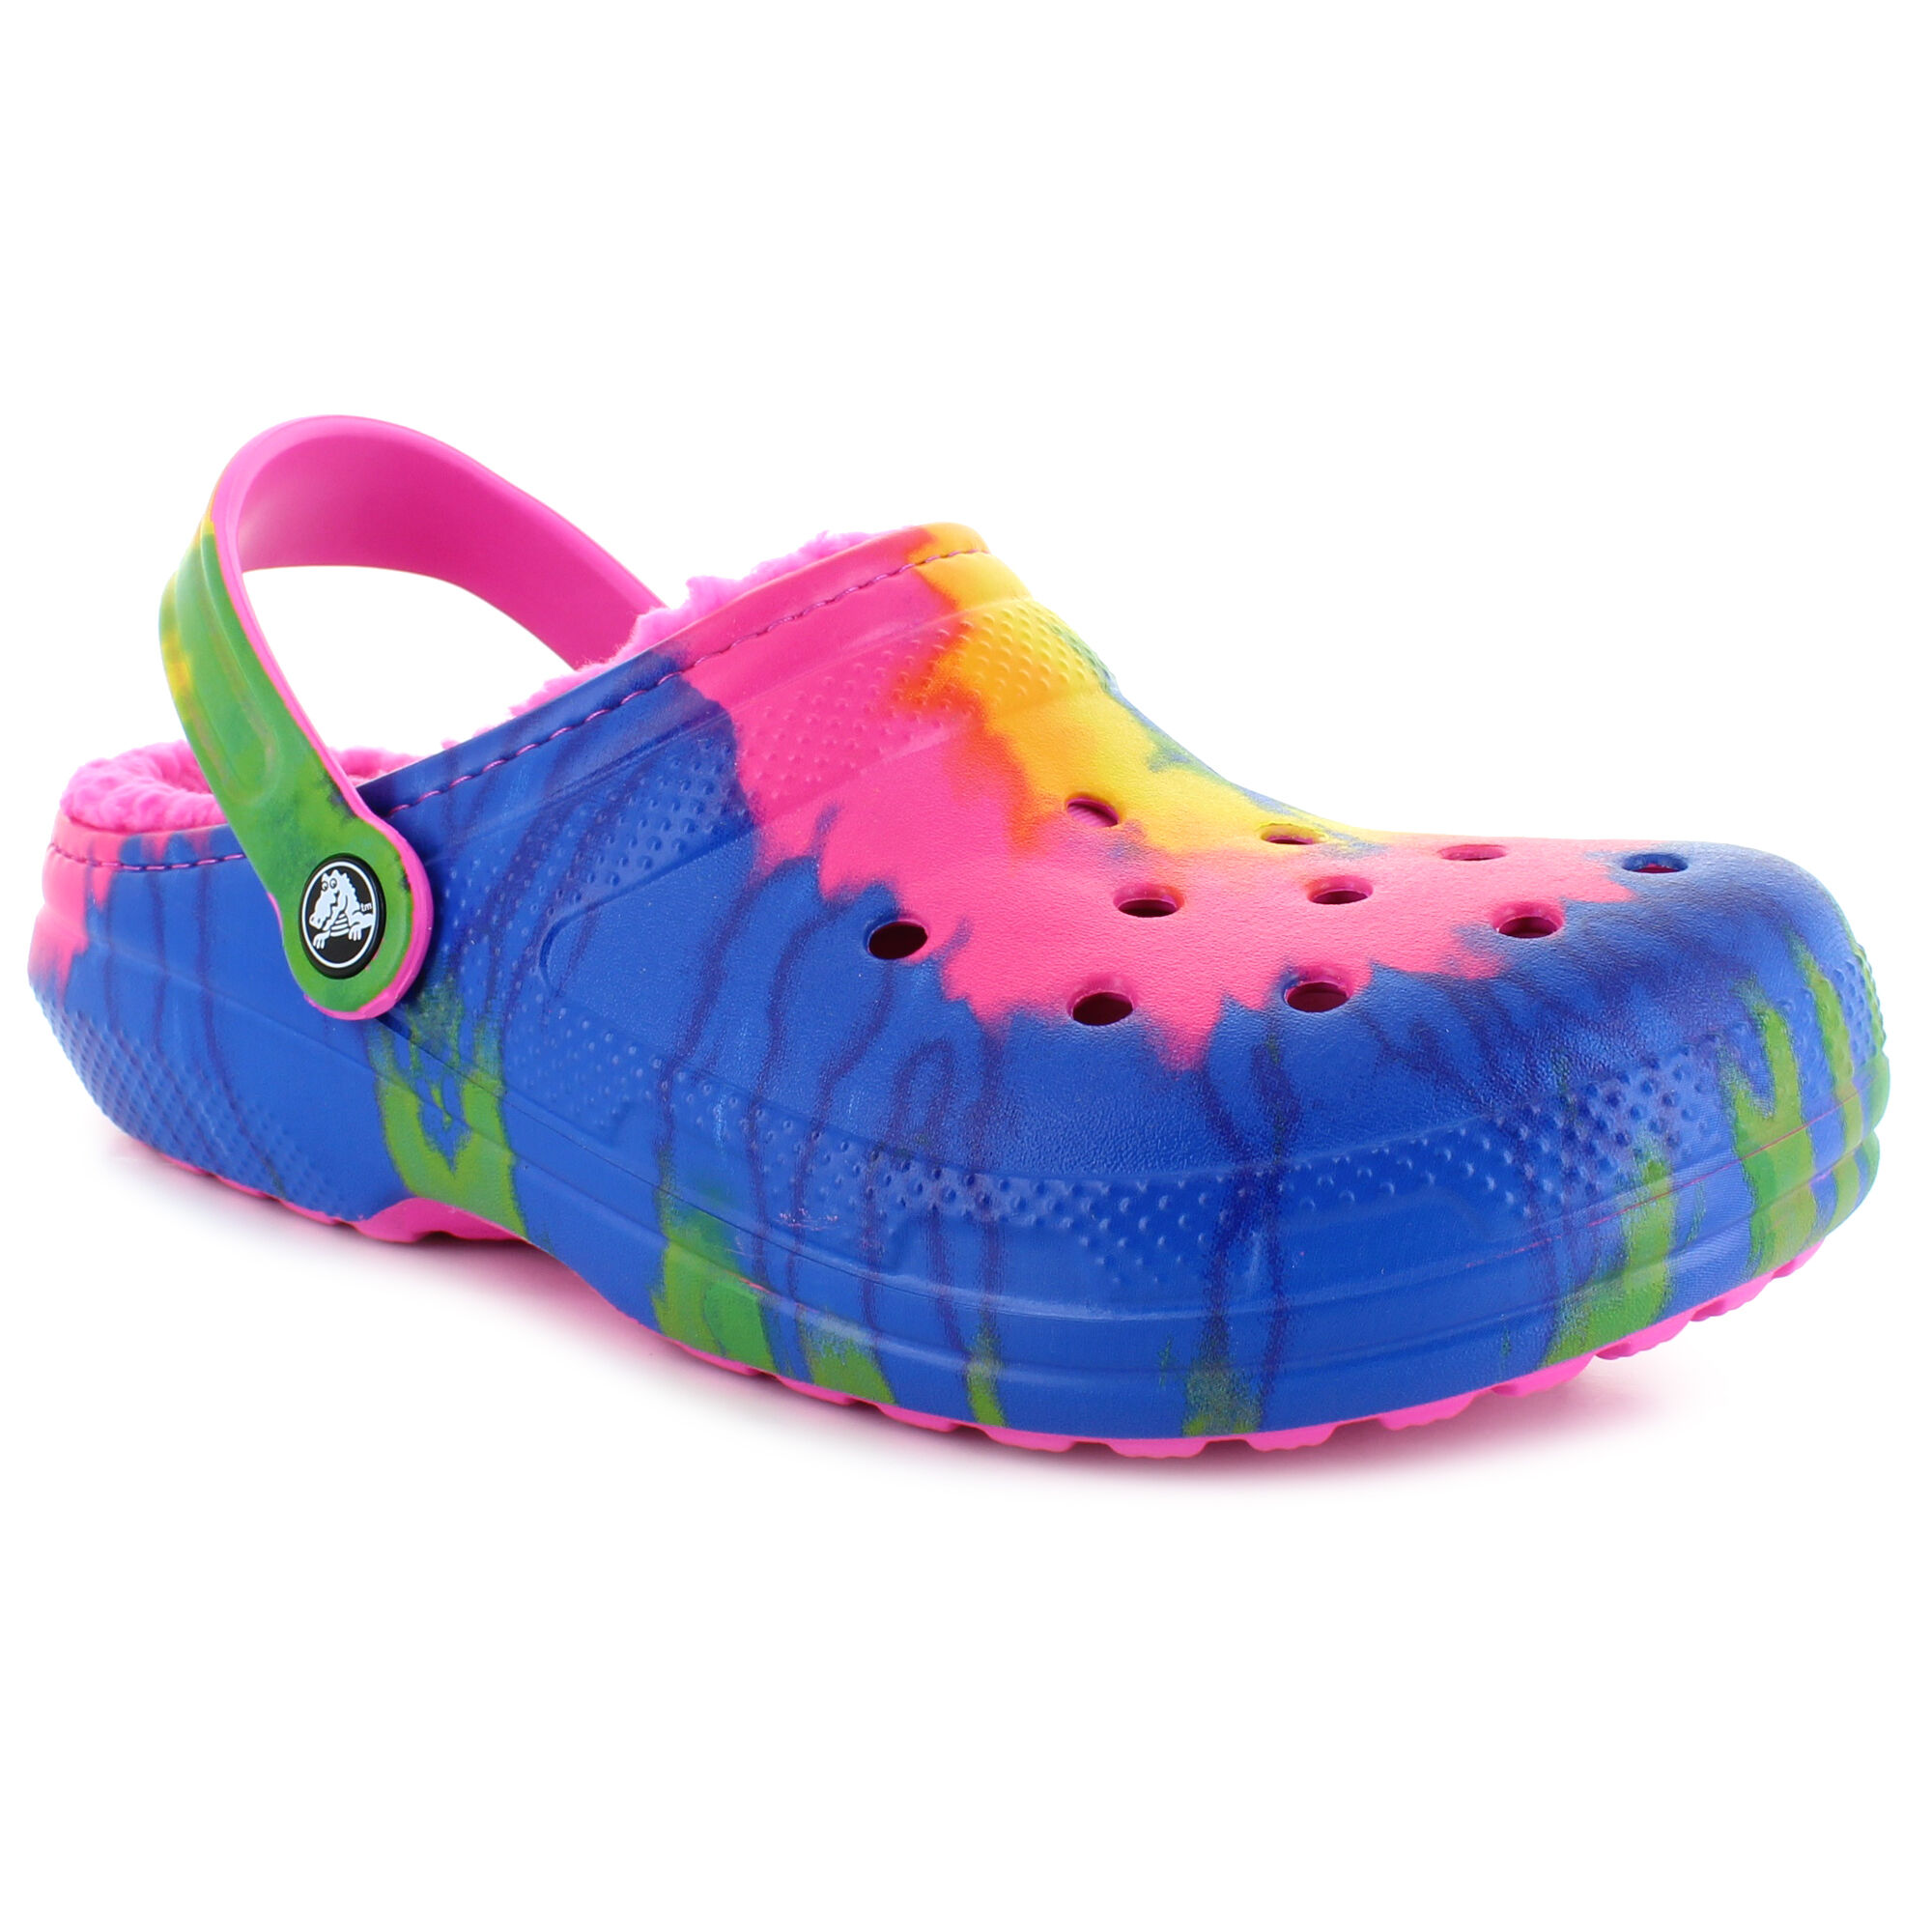 Crocs | Shop Now at SHOE SHOW MEGA